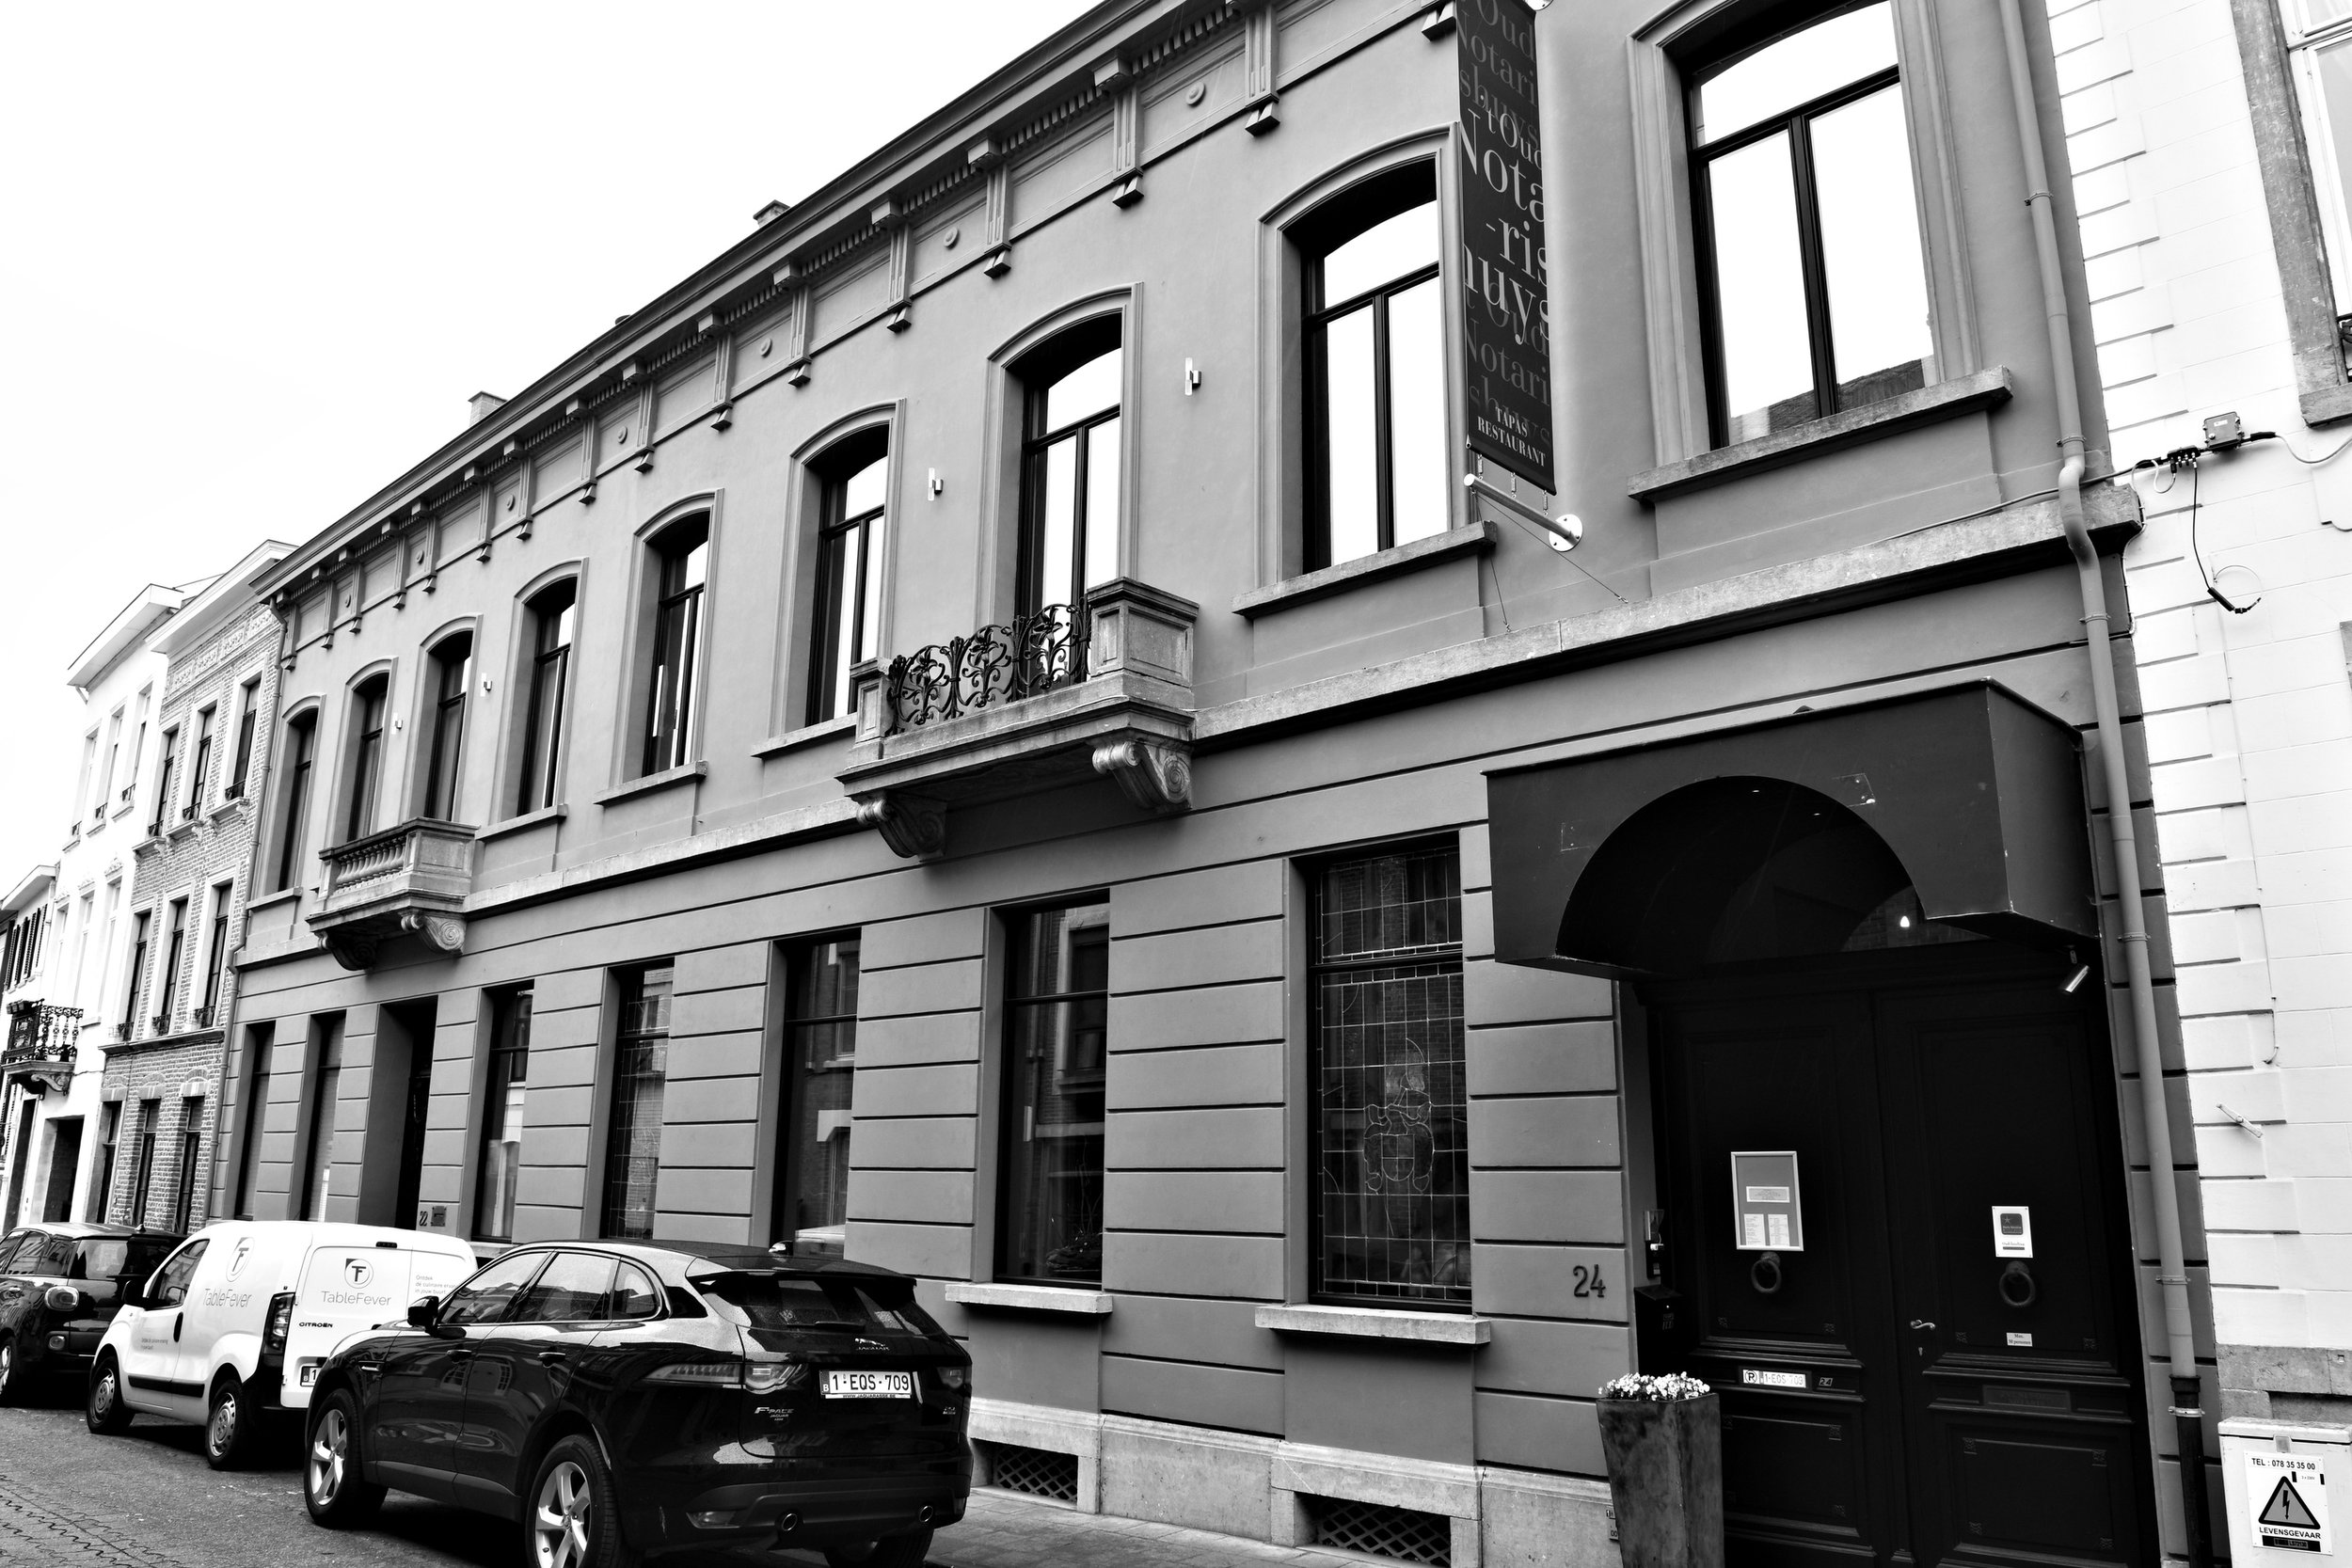 29 restaurant brasserie oud notarishuis ninove bart albrecht tablefever .jpg